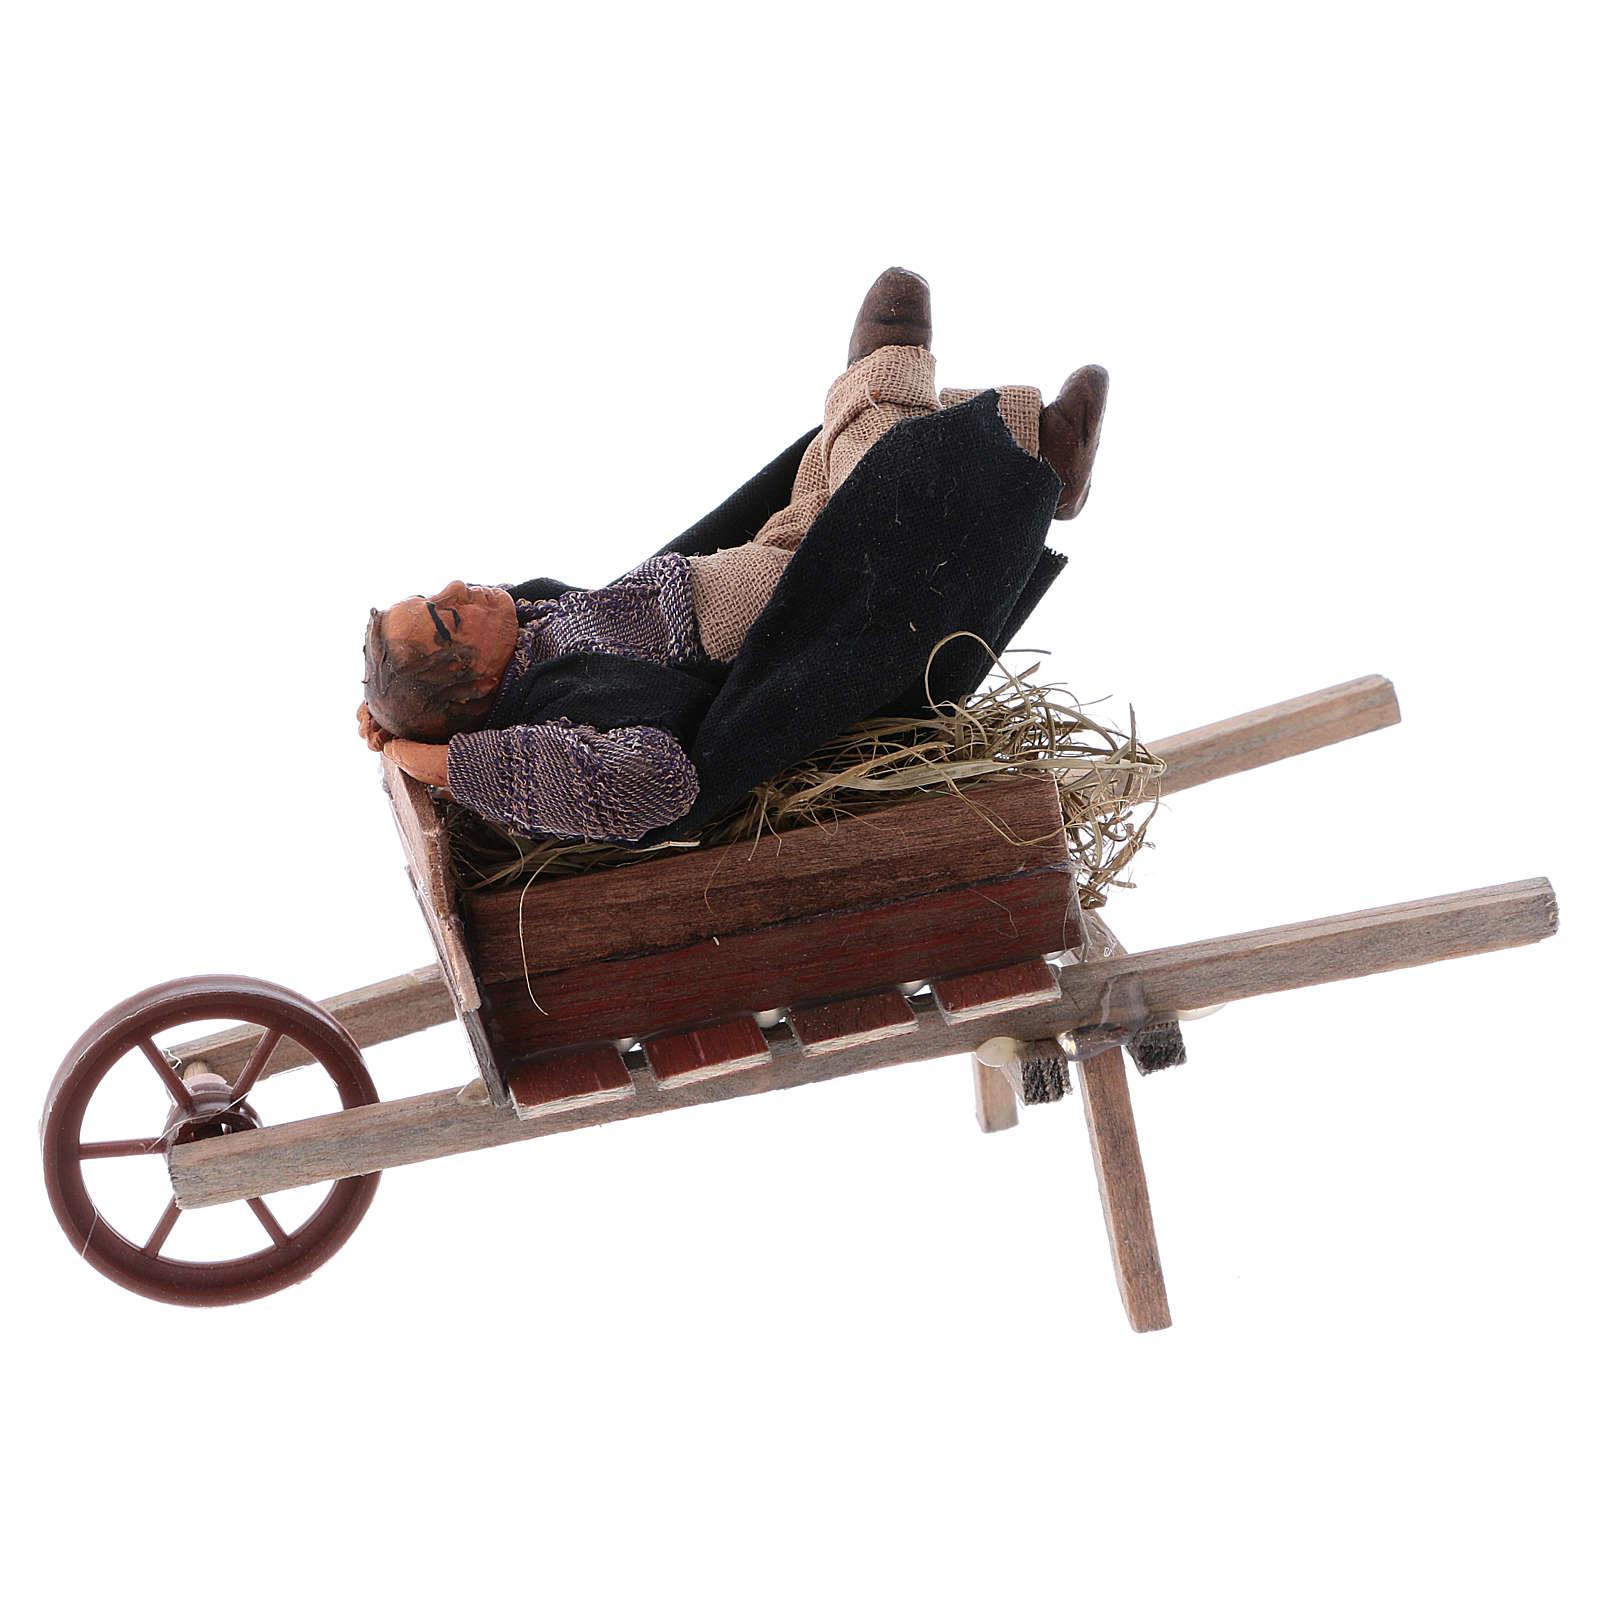 Hombre que duerme en carretilla 10 cm belén de Nápoles 4